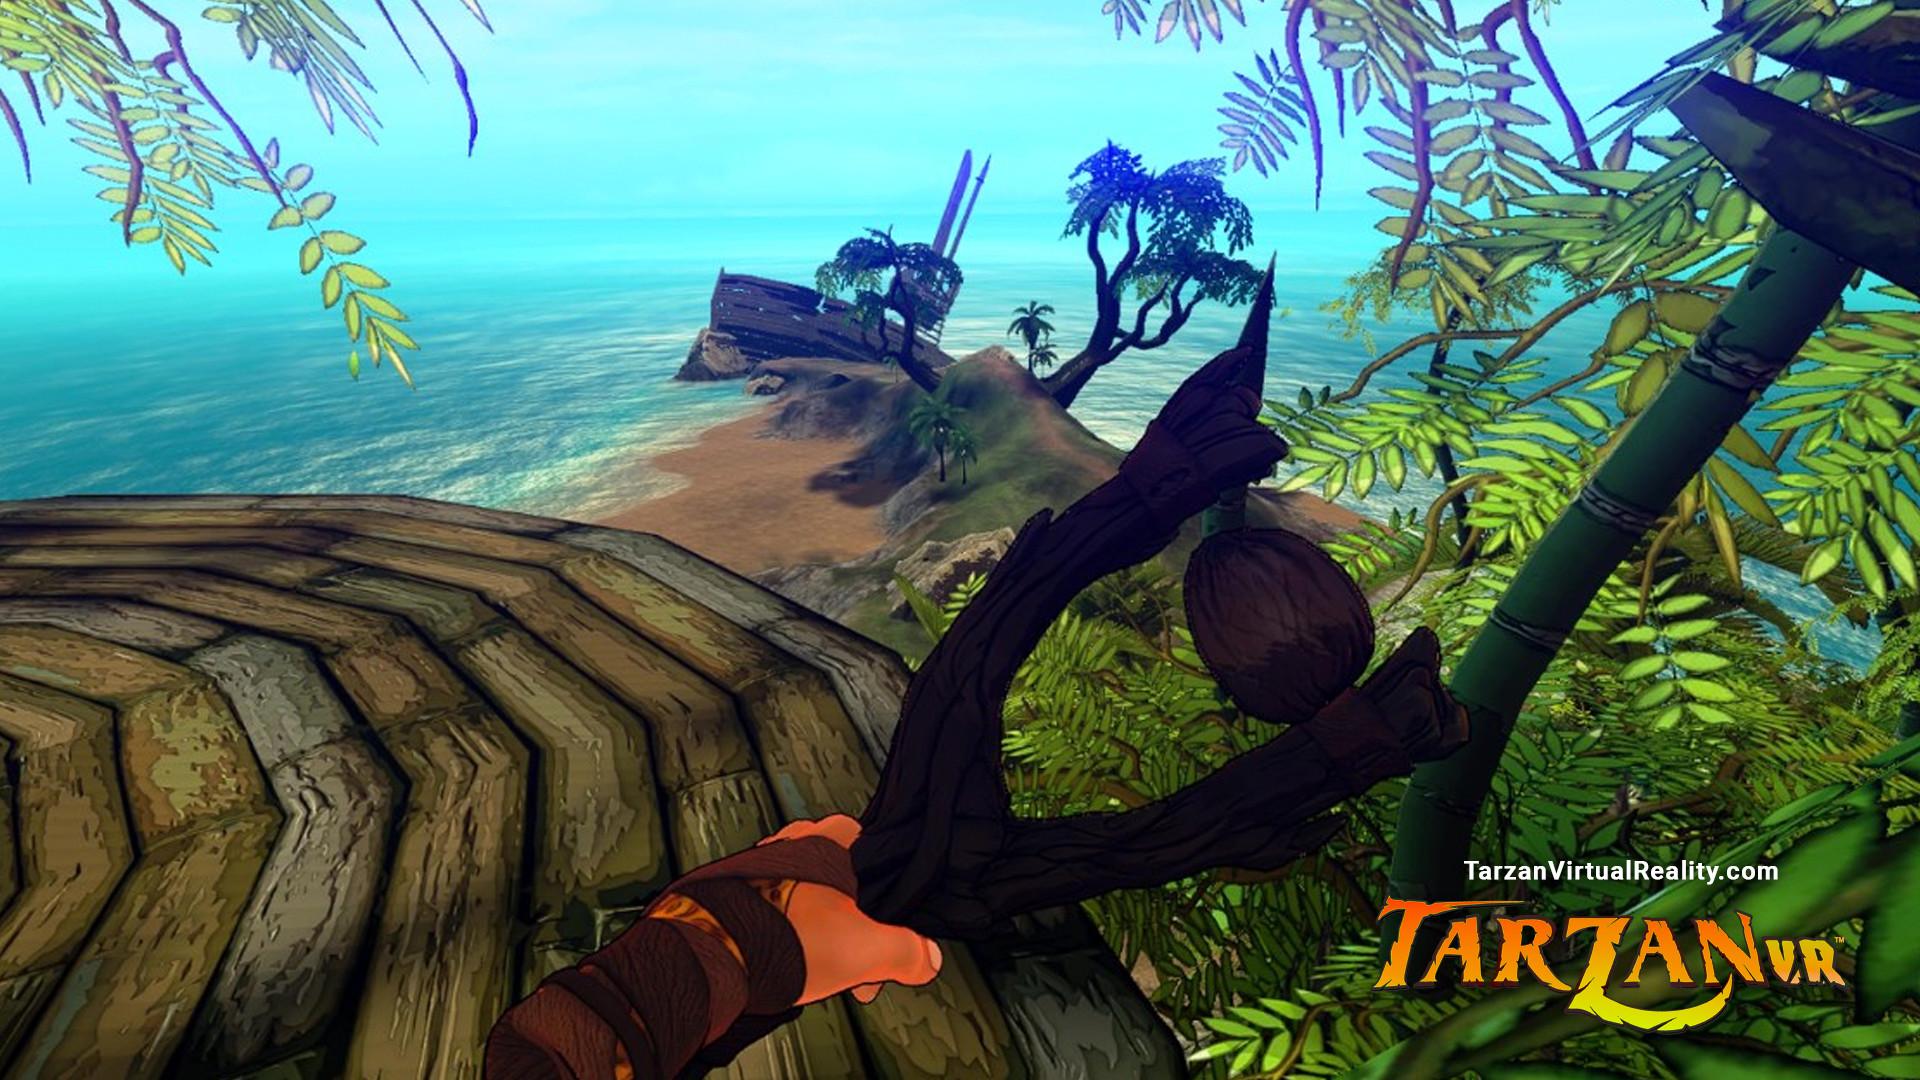 Tarzan Vr On Steam